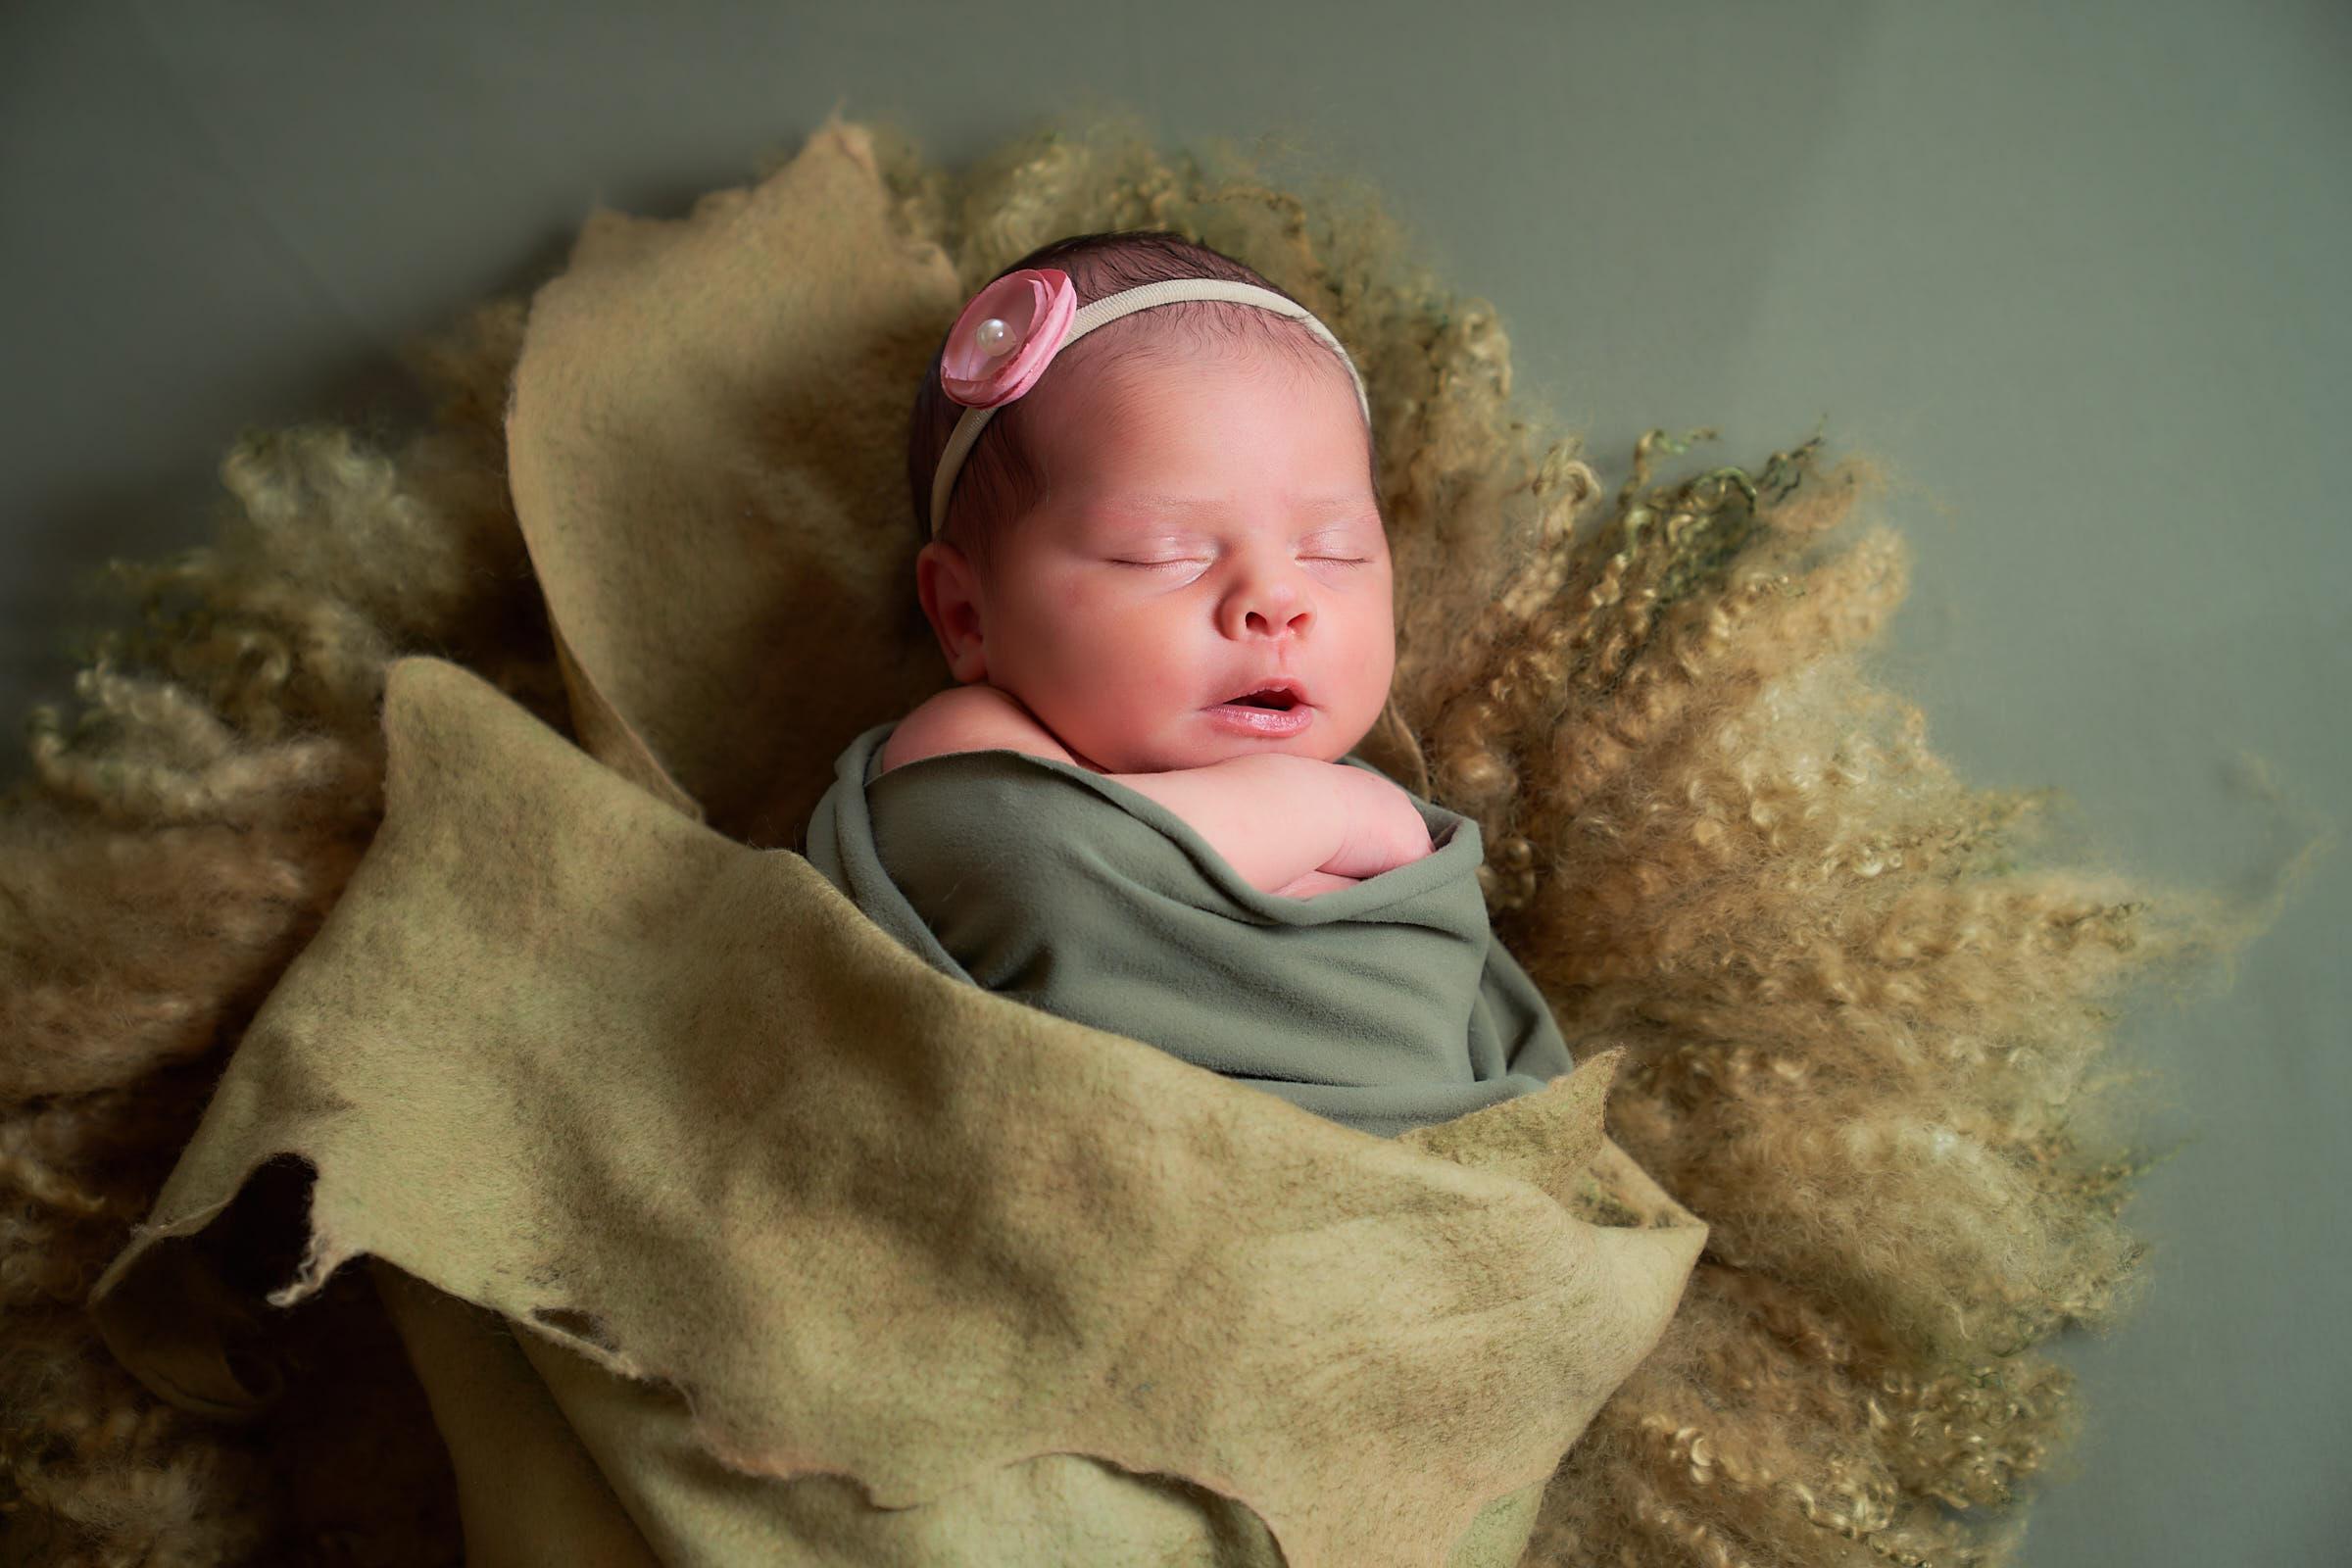 Kauai Baby Photographer Studio Set Up Inhome